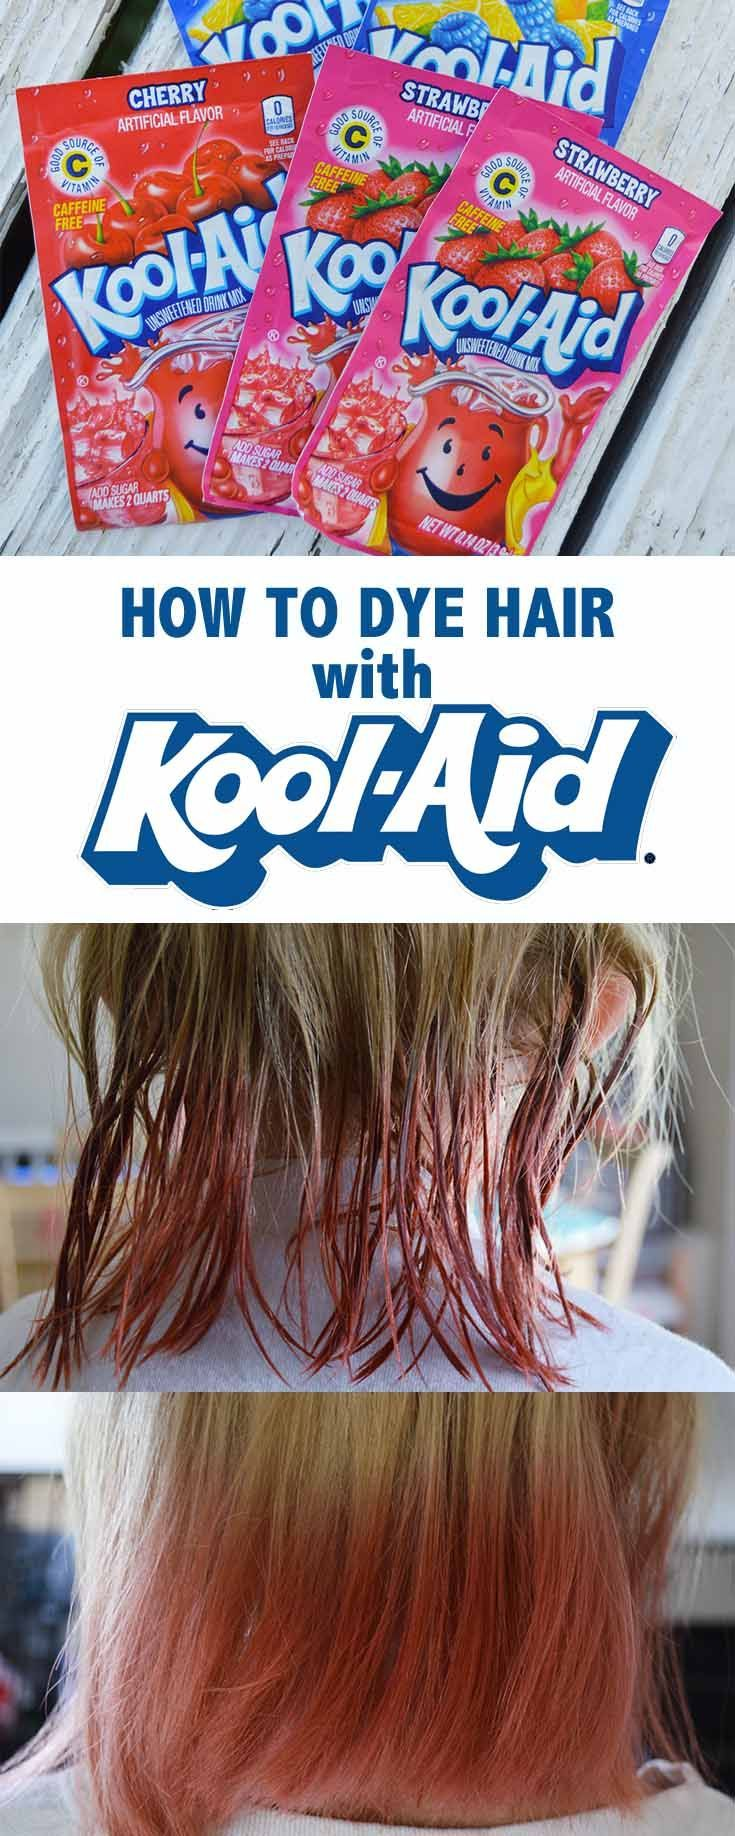 Everything You Need To Know To Dye Your Hair With Kool Aid Kool Aid Hair Dye Kids Hair Color Kool Aid Hair